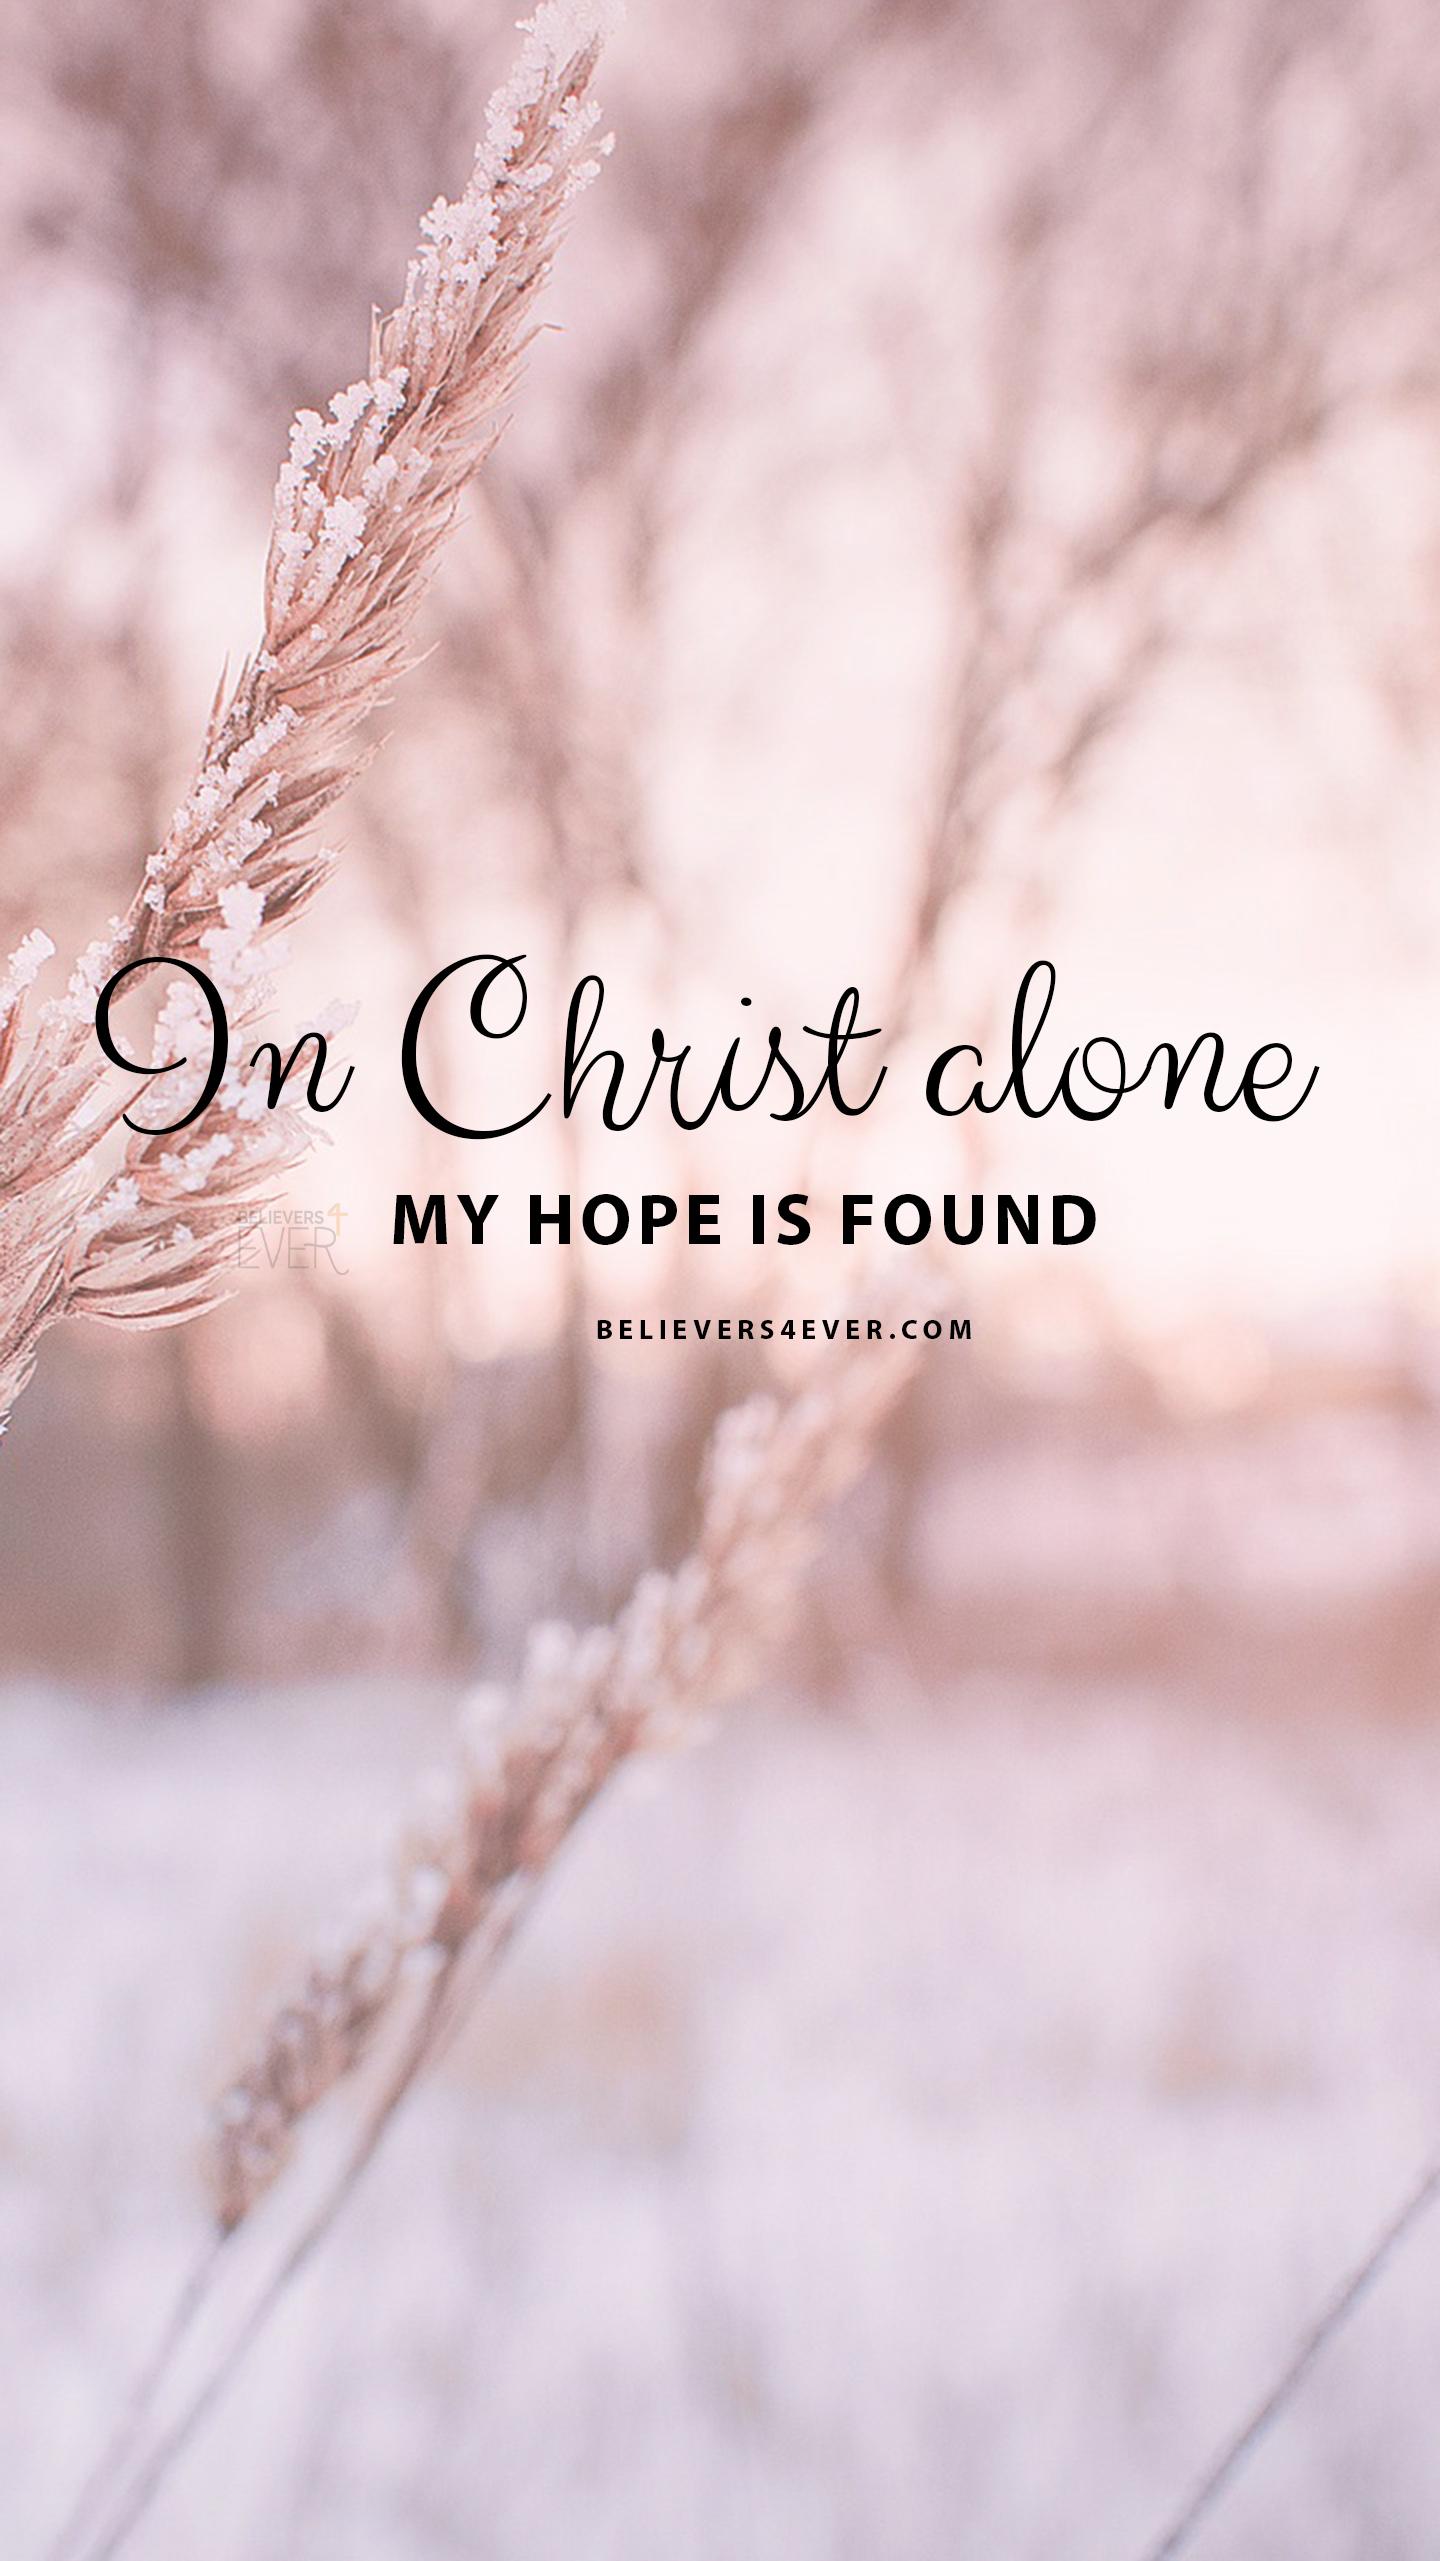 In Christ alone mobile wallpaper